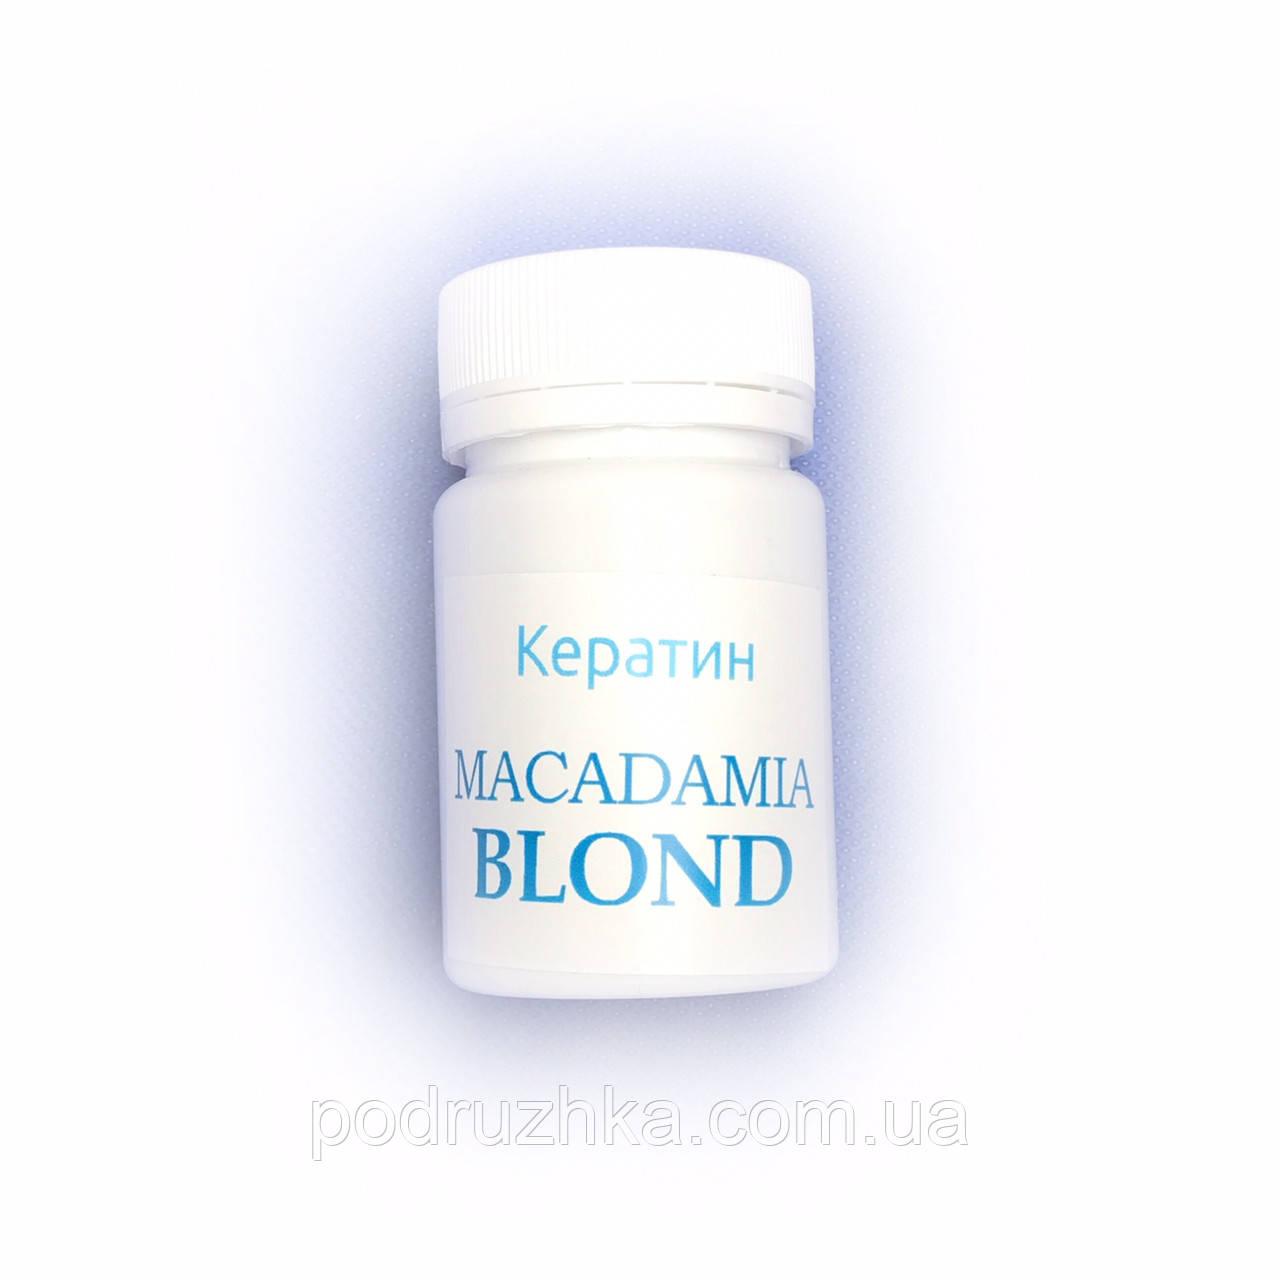 Кератин для волос Macadamia Ultimate Blond (шаг 2) 200 г